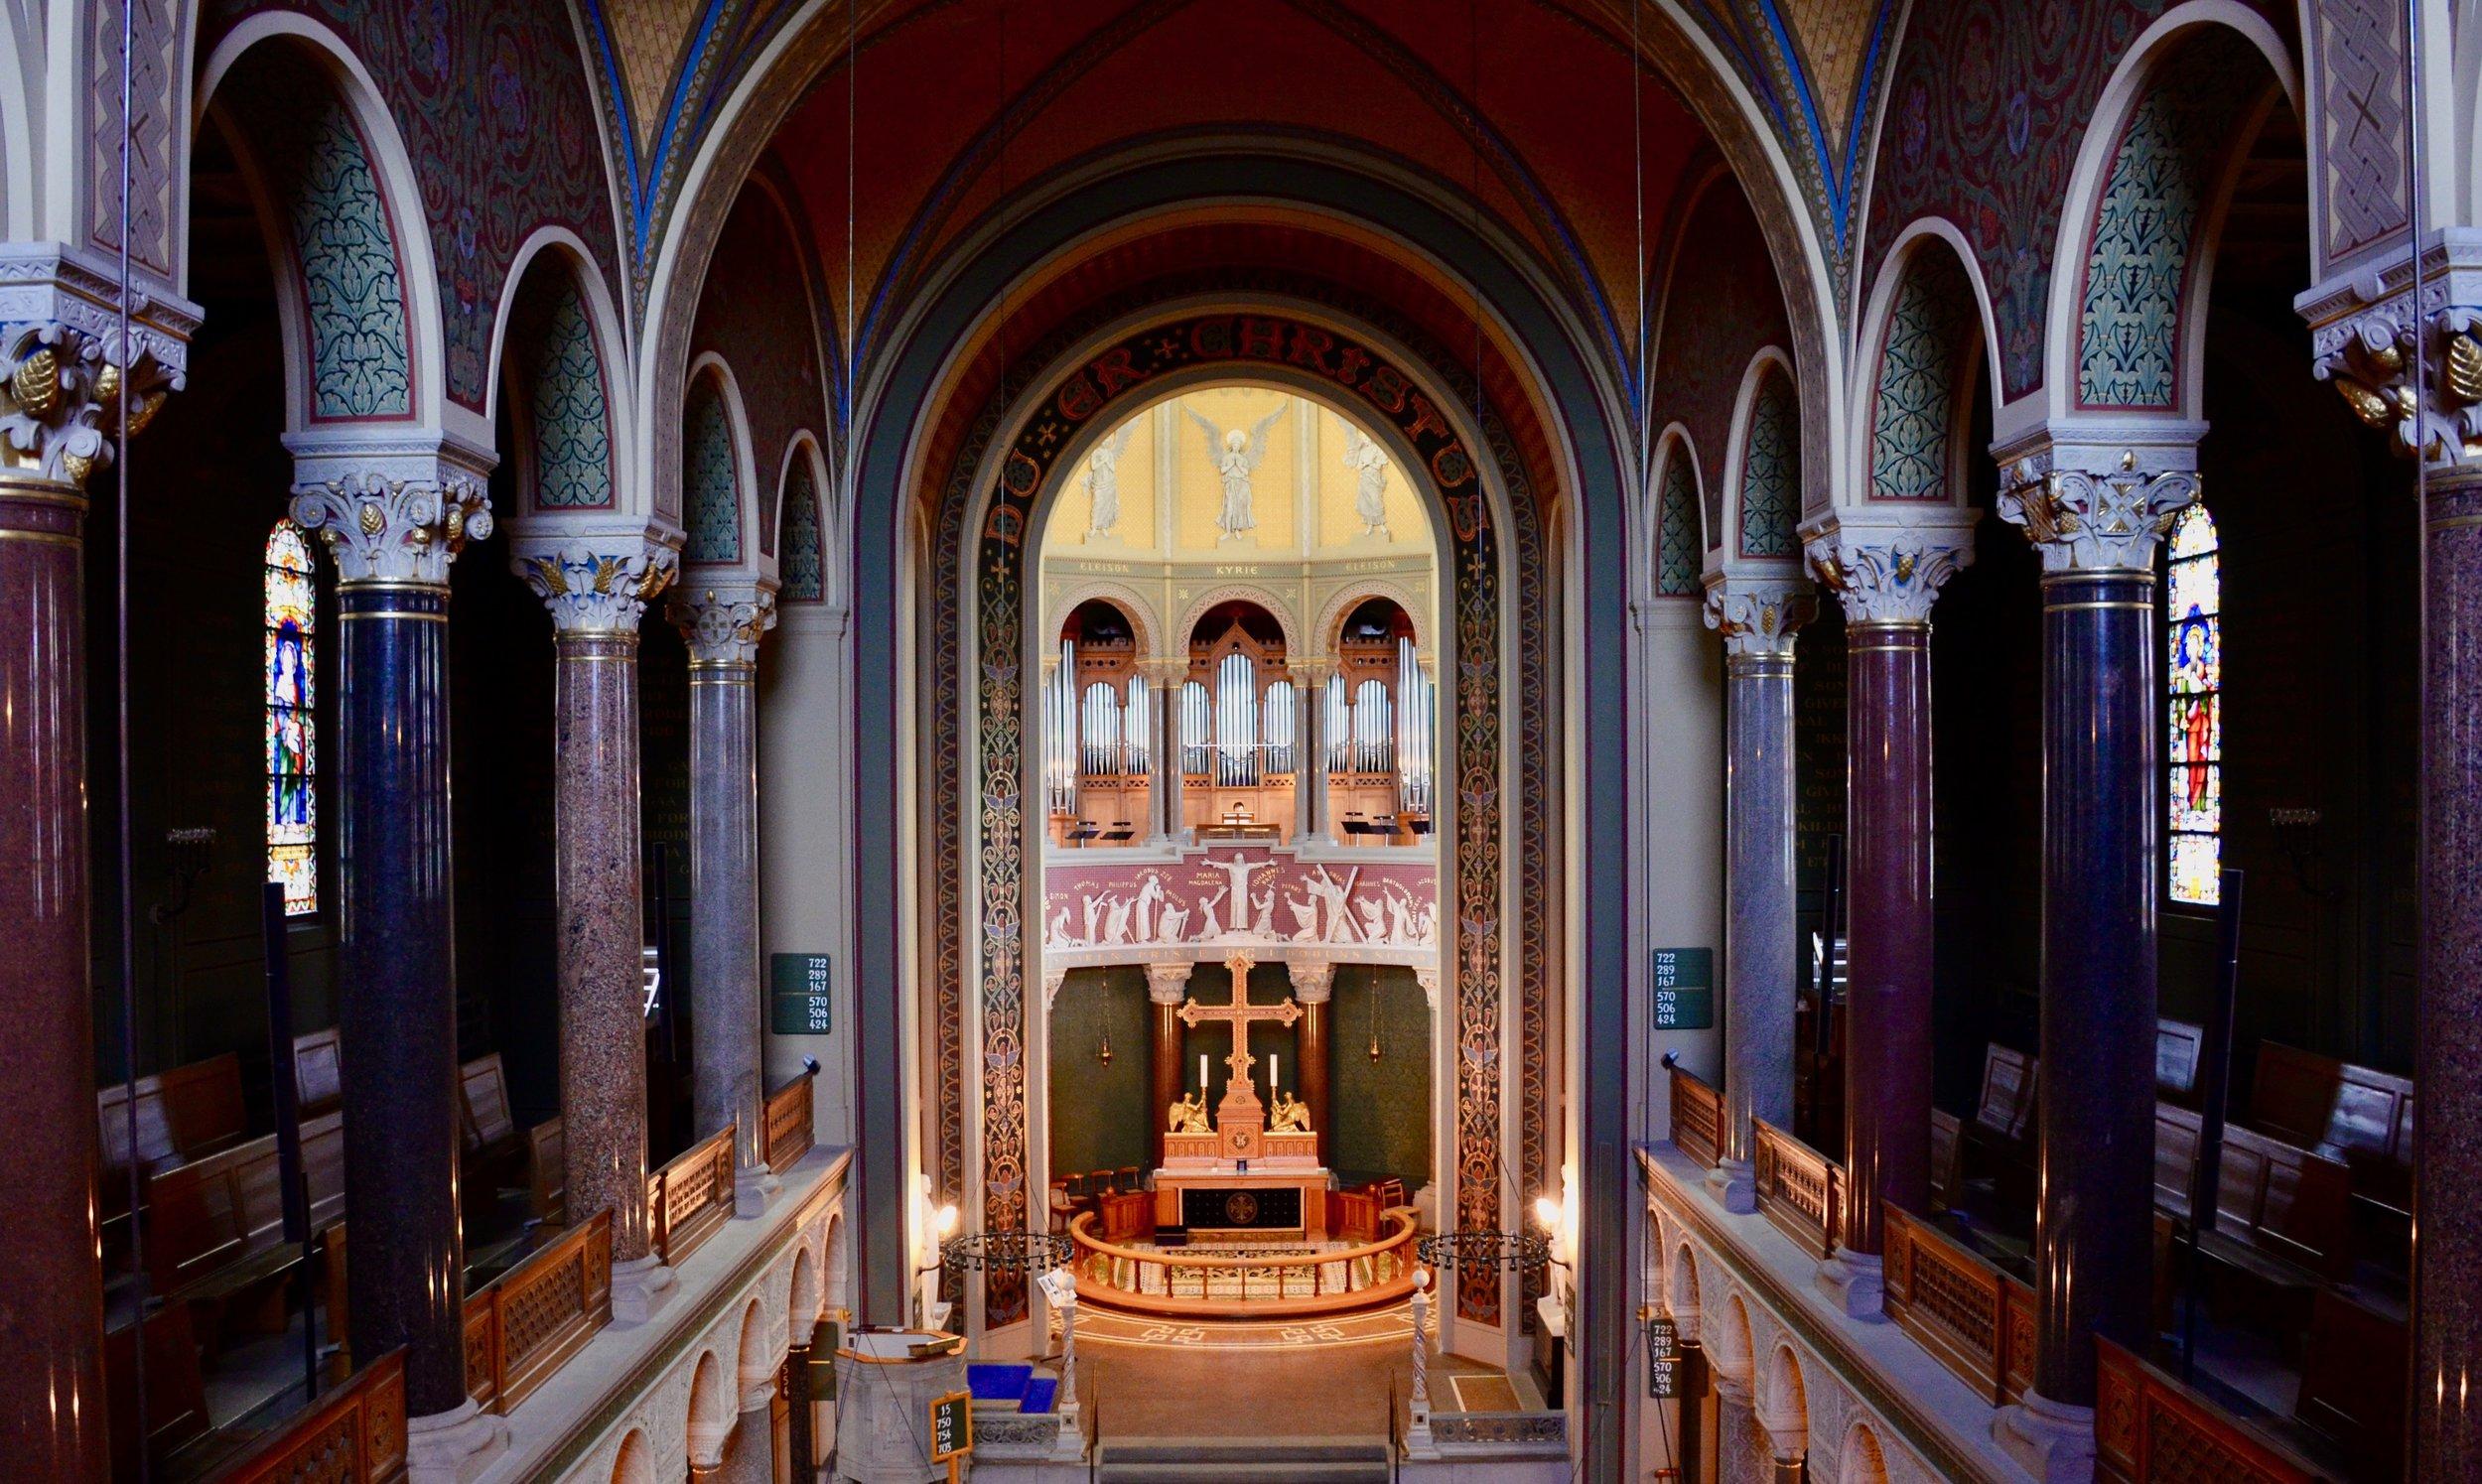 The 1890 Cavaillé-Coll organ in Jesuskirke, Copenhagen.